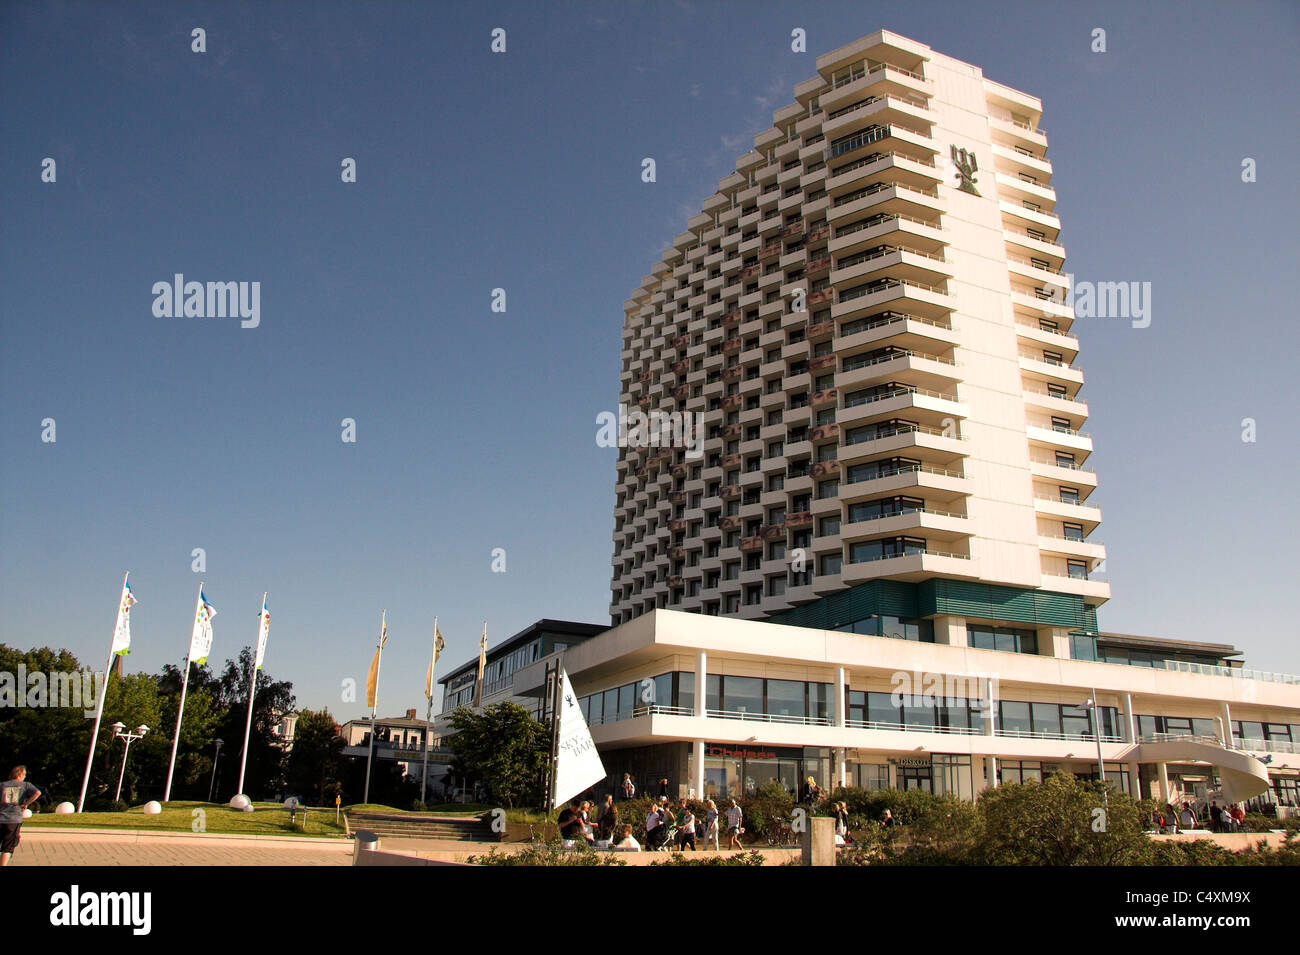 Hotel neptun stock photos hotel neptun stock images alamy for Hotels warnemunde und umgebung